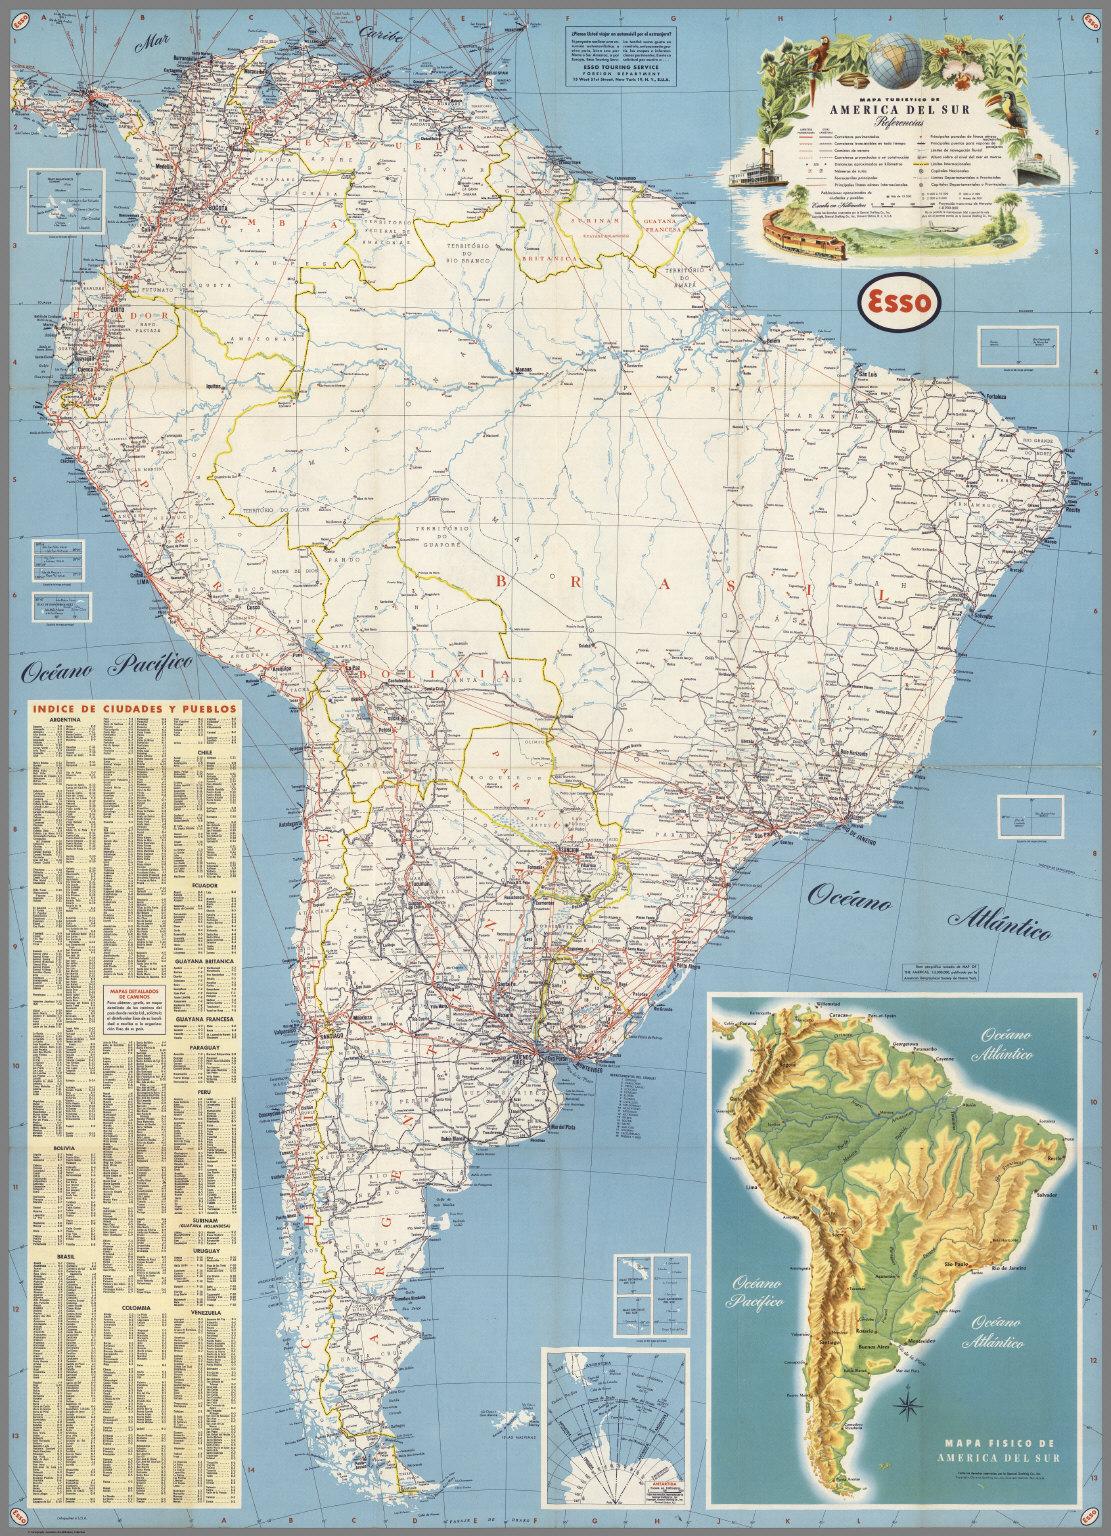 Mapa turistico de America del Sur - David Rumsey Historical Map ...